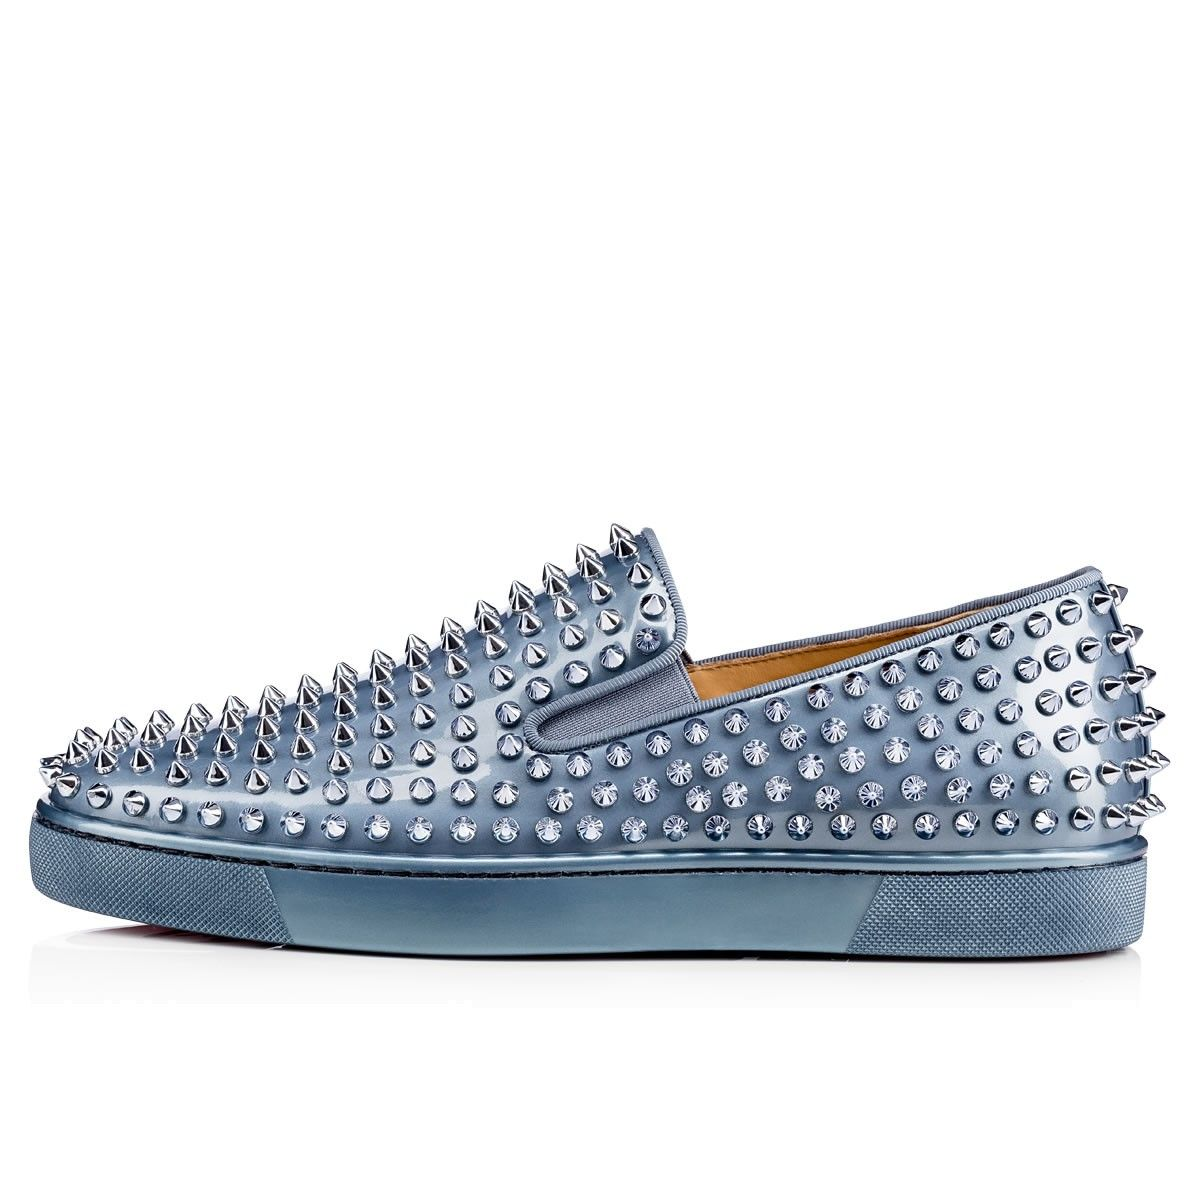 Roller pump shoes - Roller Boat Men S Flat Poseidon Metal Patent Men Shoes Christian Louboutin